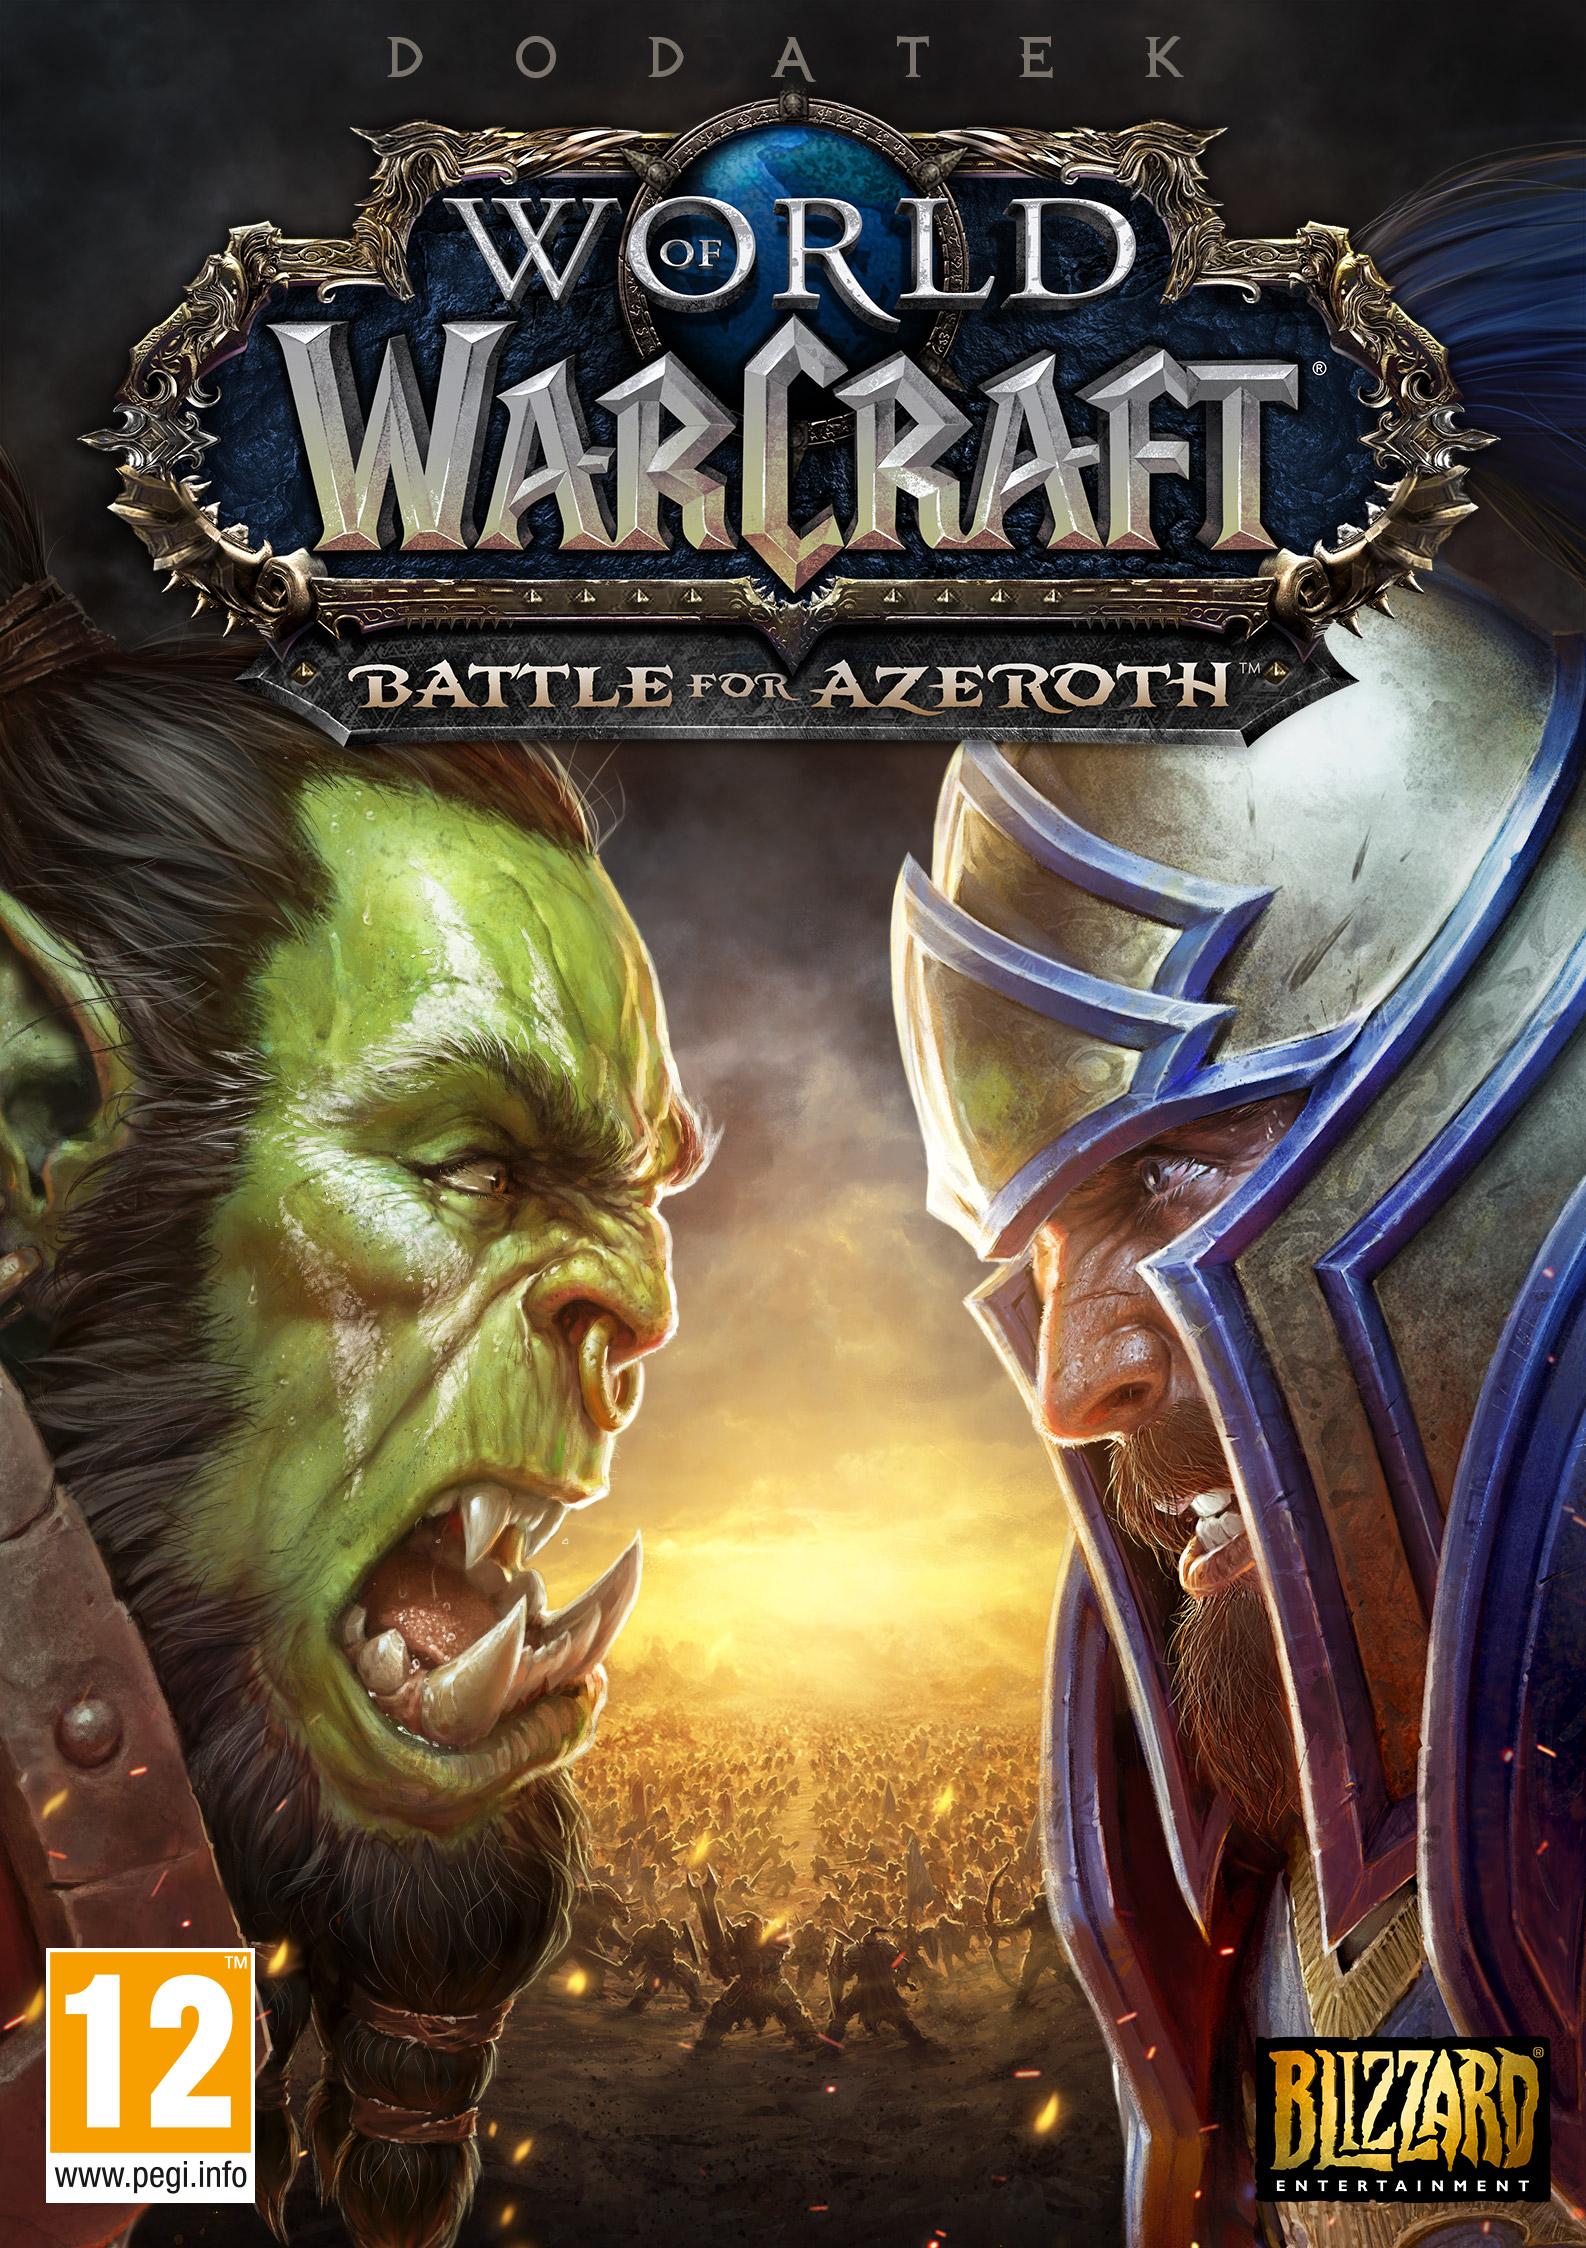 World of Warcraft: Battle for Azeroth battle.net